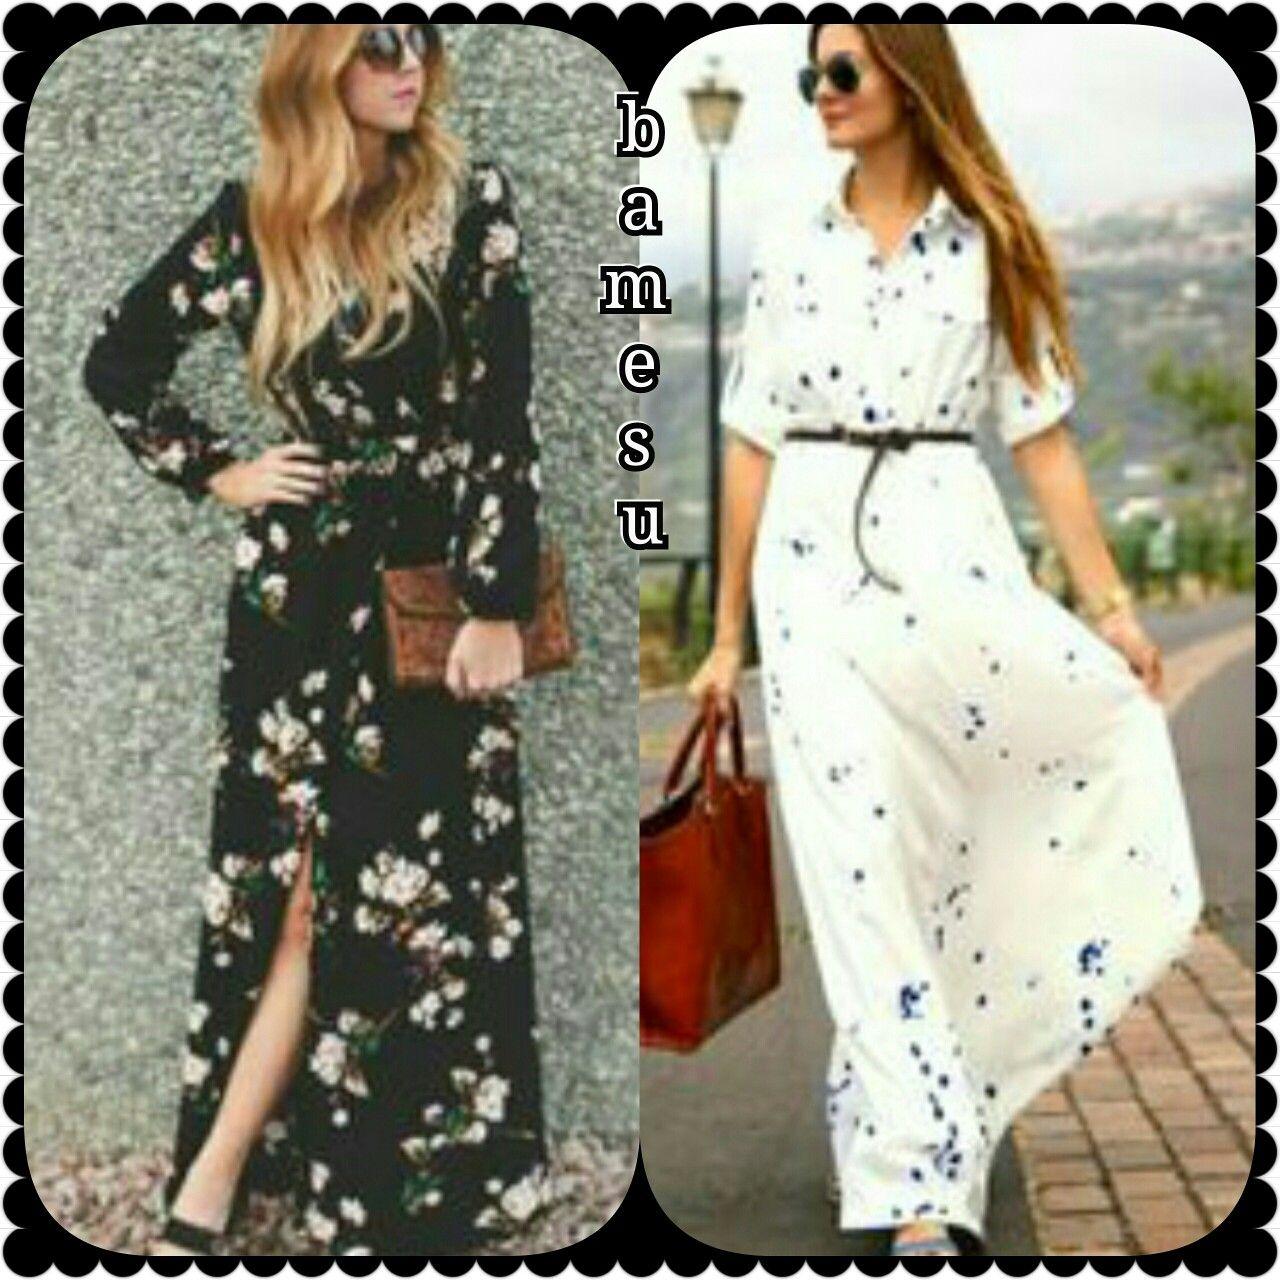 Toptan Tekstil Turkiye Turkey Istanbul Ankara Izmir Izmit Butik Fashion Moda Giyim Bayangiyim Textile Kumas Toptankumas Elbiseler Giyim Moda